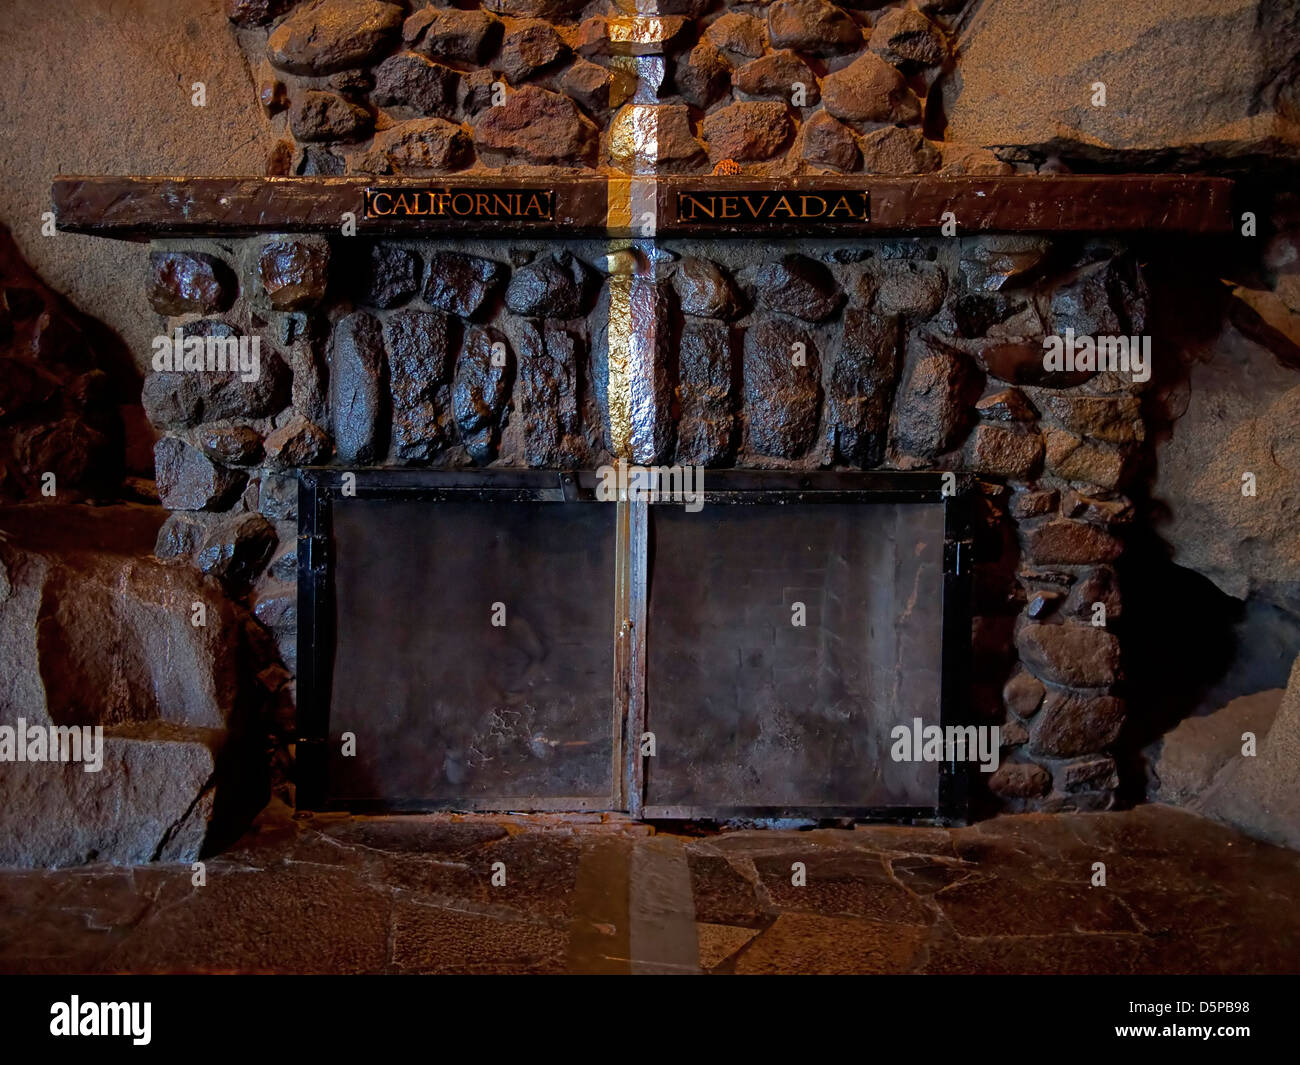 Cal Neva - Stock Image